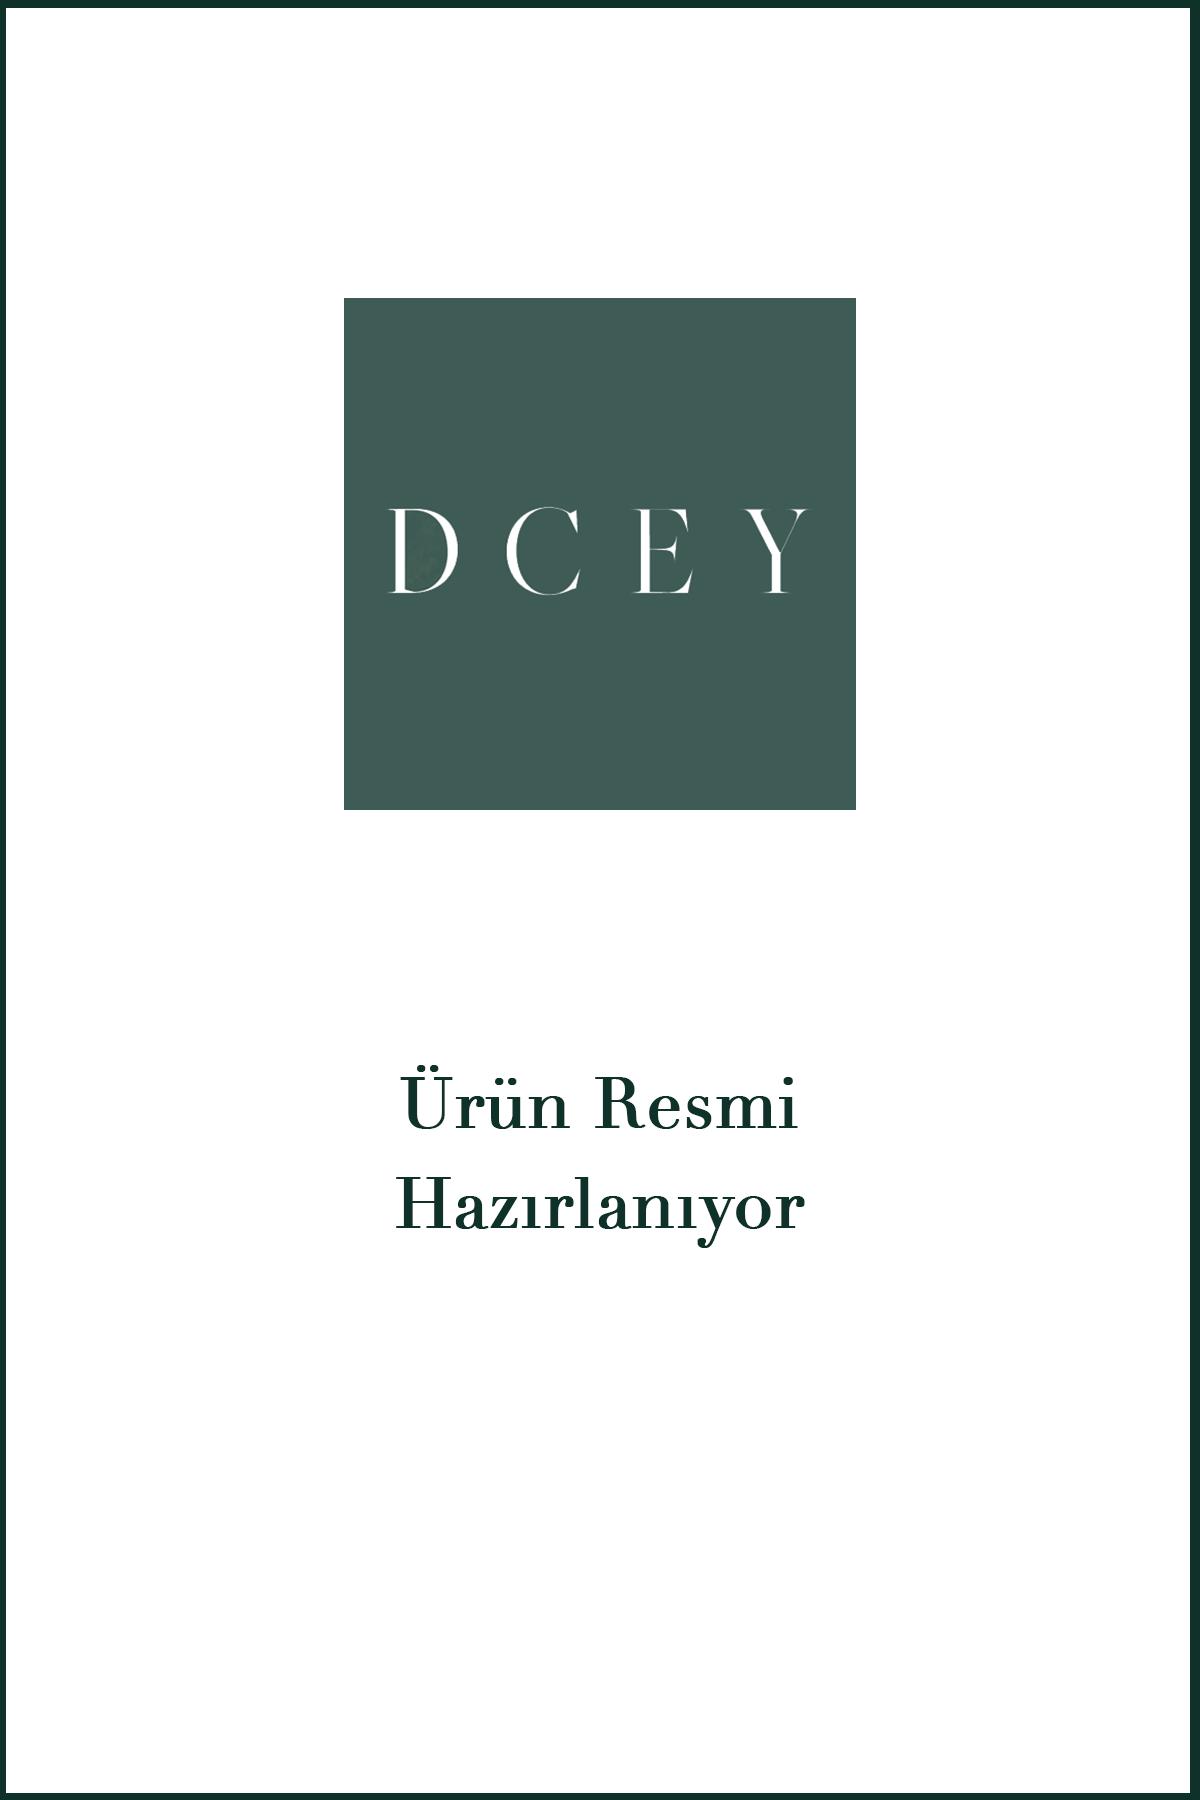 Adorn Elbise